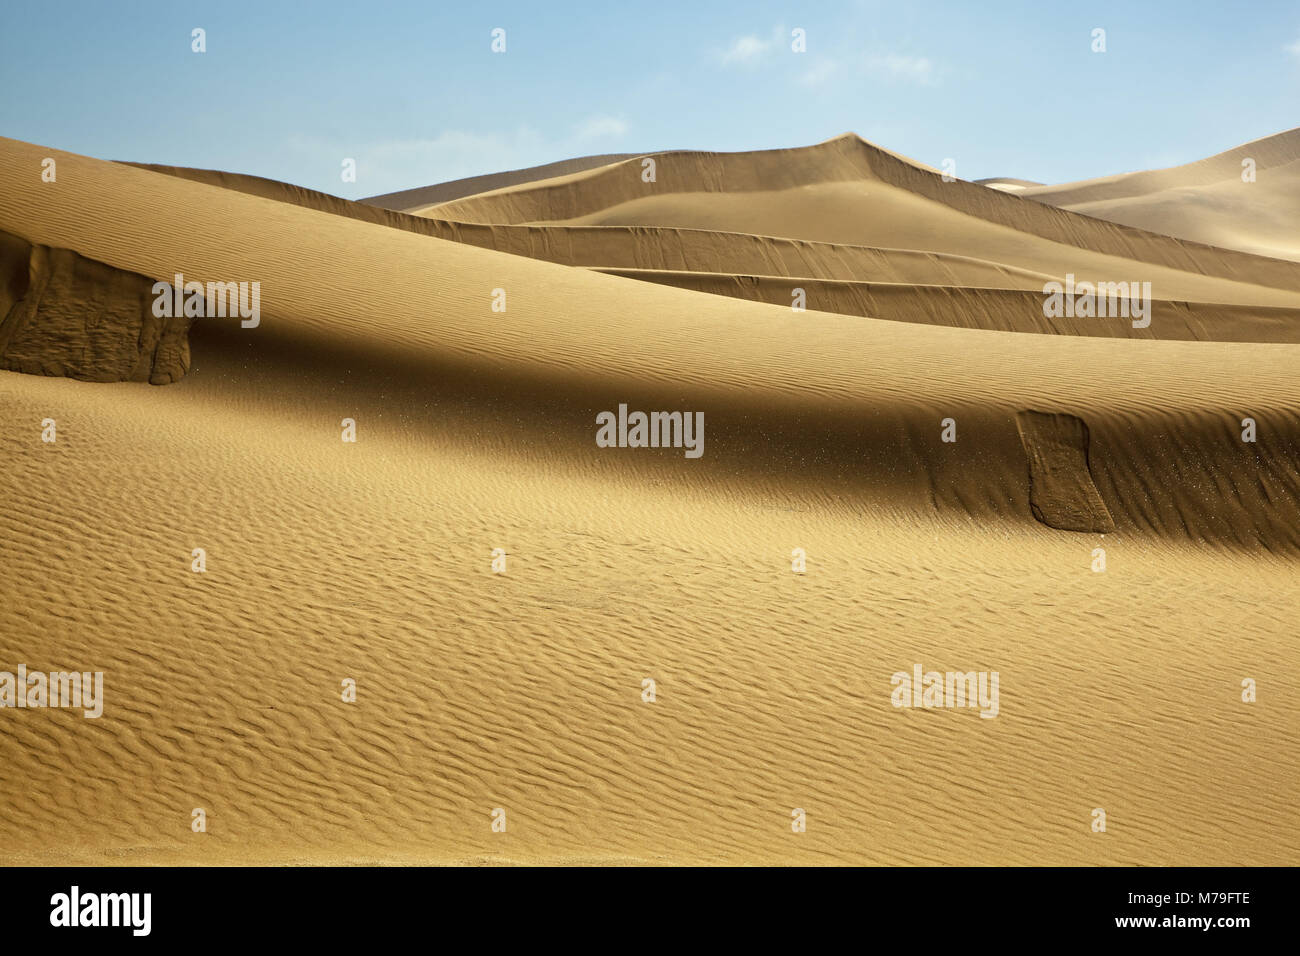 Africa, Namibia, Namib desert, dune area, desert, Erongo region, Namibwüste, scenery, whale fish-Swakopmund, - Stock Image